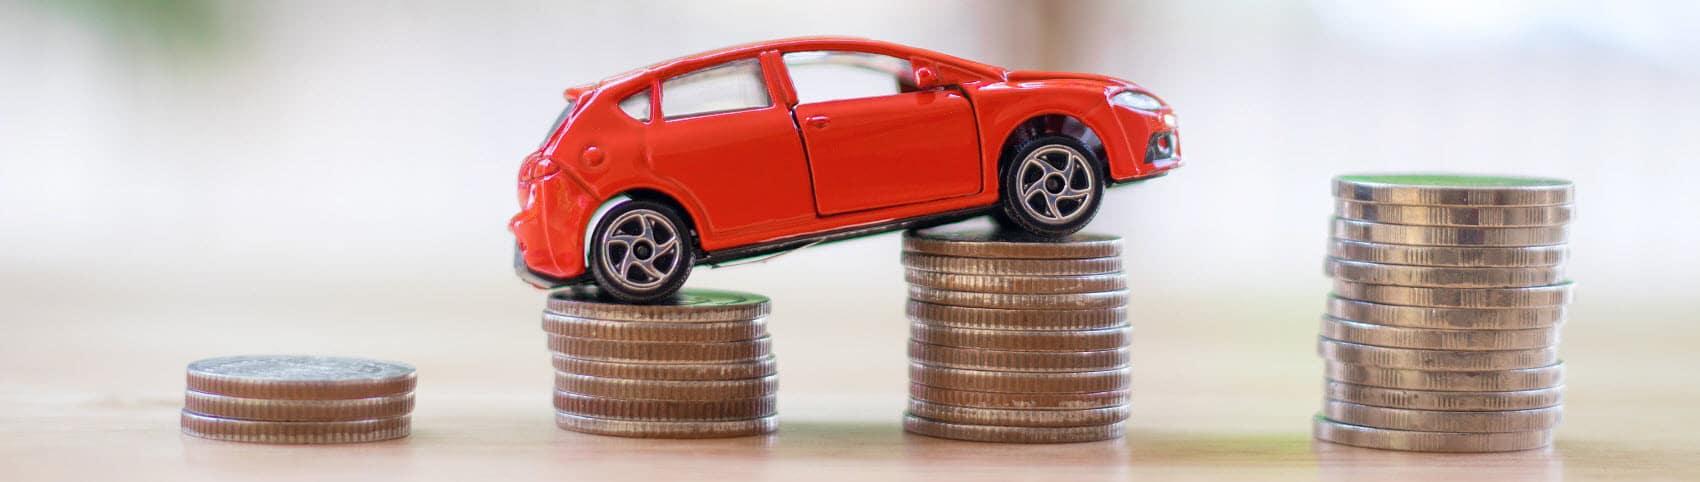 We Buy Used Cars | Volkswagen of Panama City